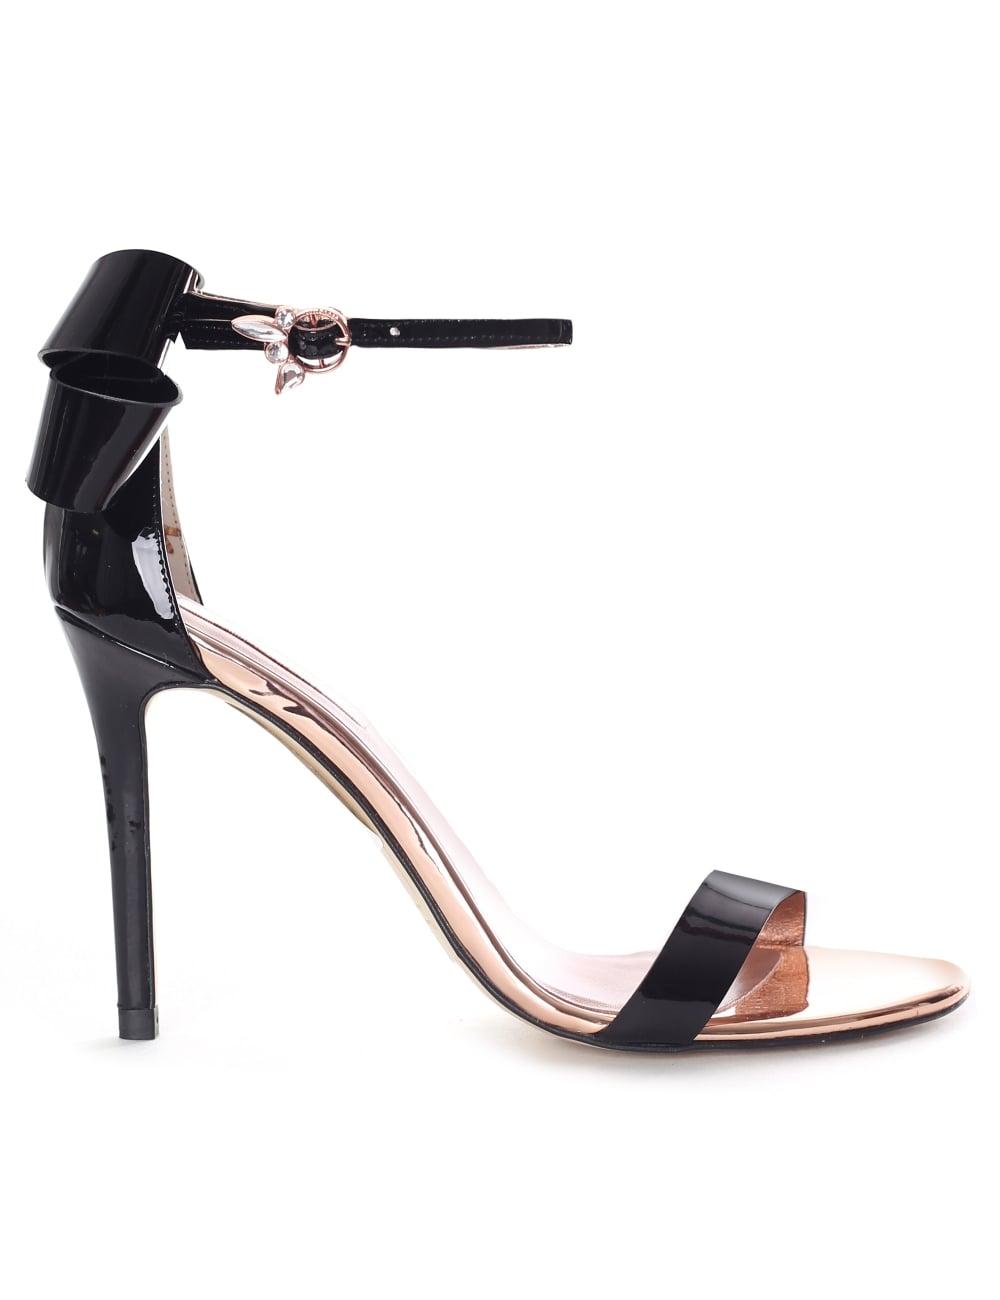 Sandals Heeled Sandalo Back Patent Women's Bow CQsxtBhrd